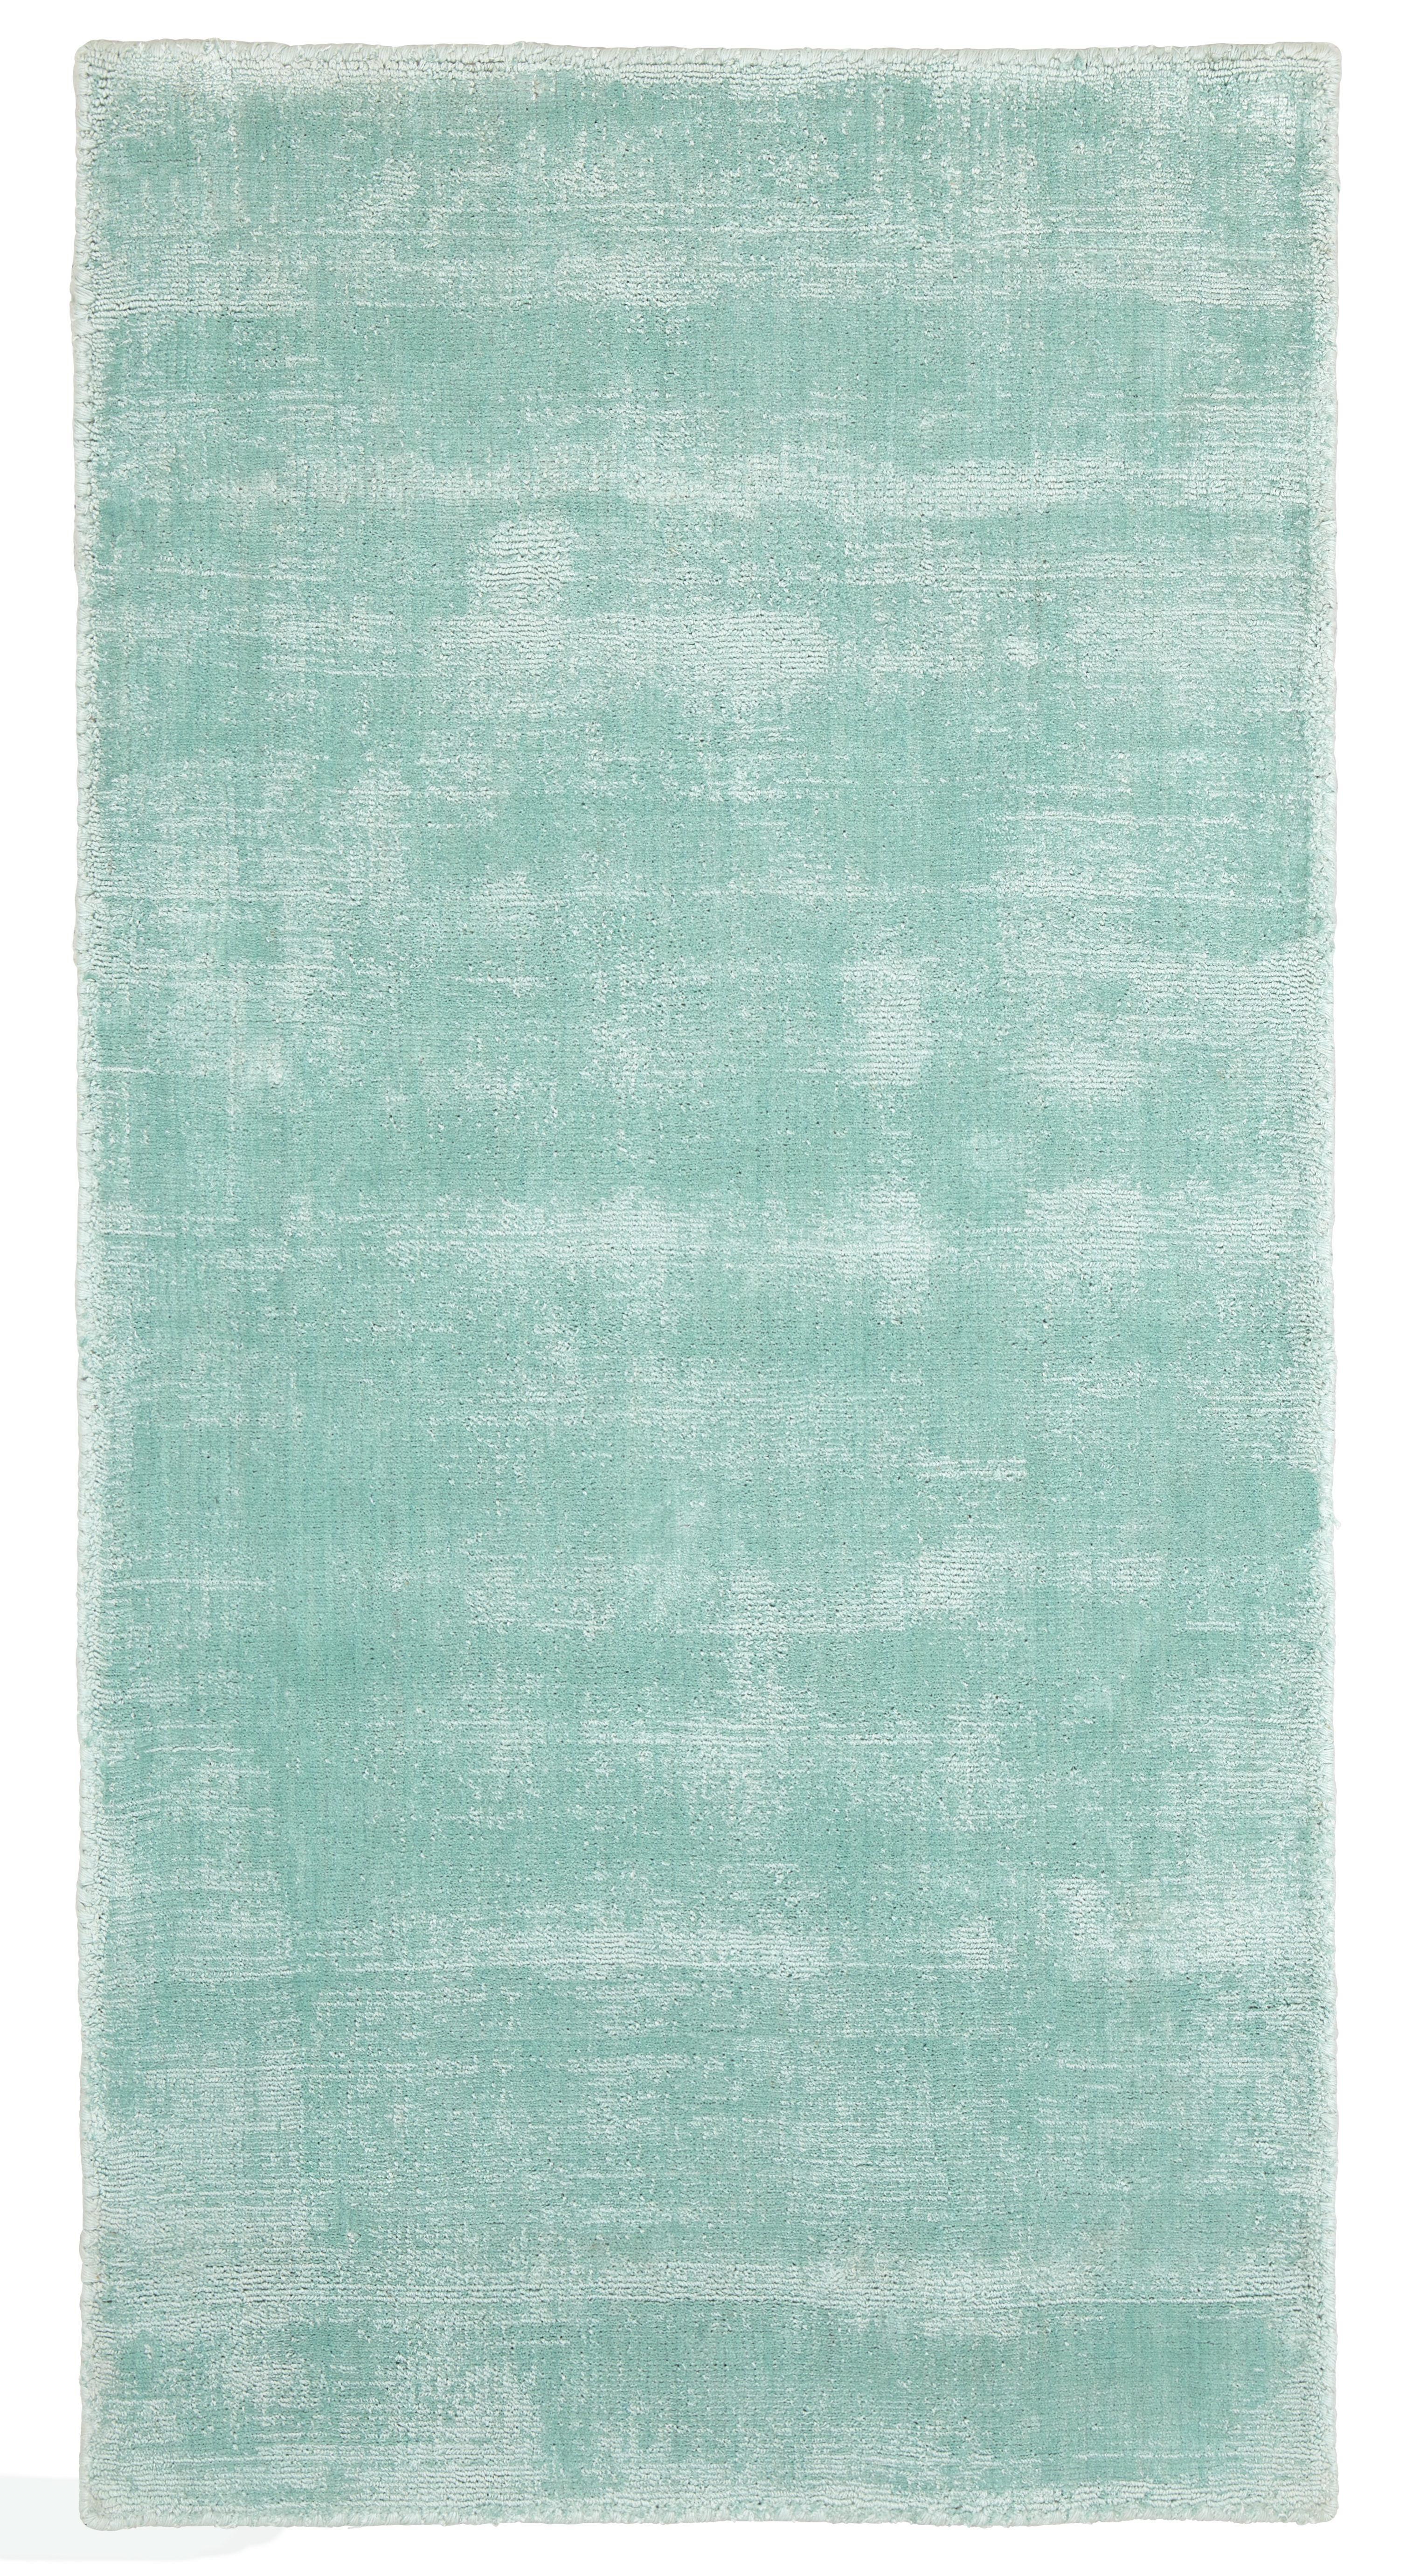 Webteppich Andrea in Mint ca. 120x170cm - Mintgrün, Textil (120/170cm) - MÖMAX modern living